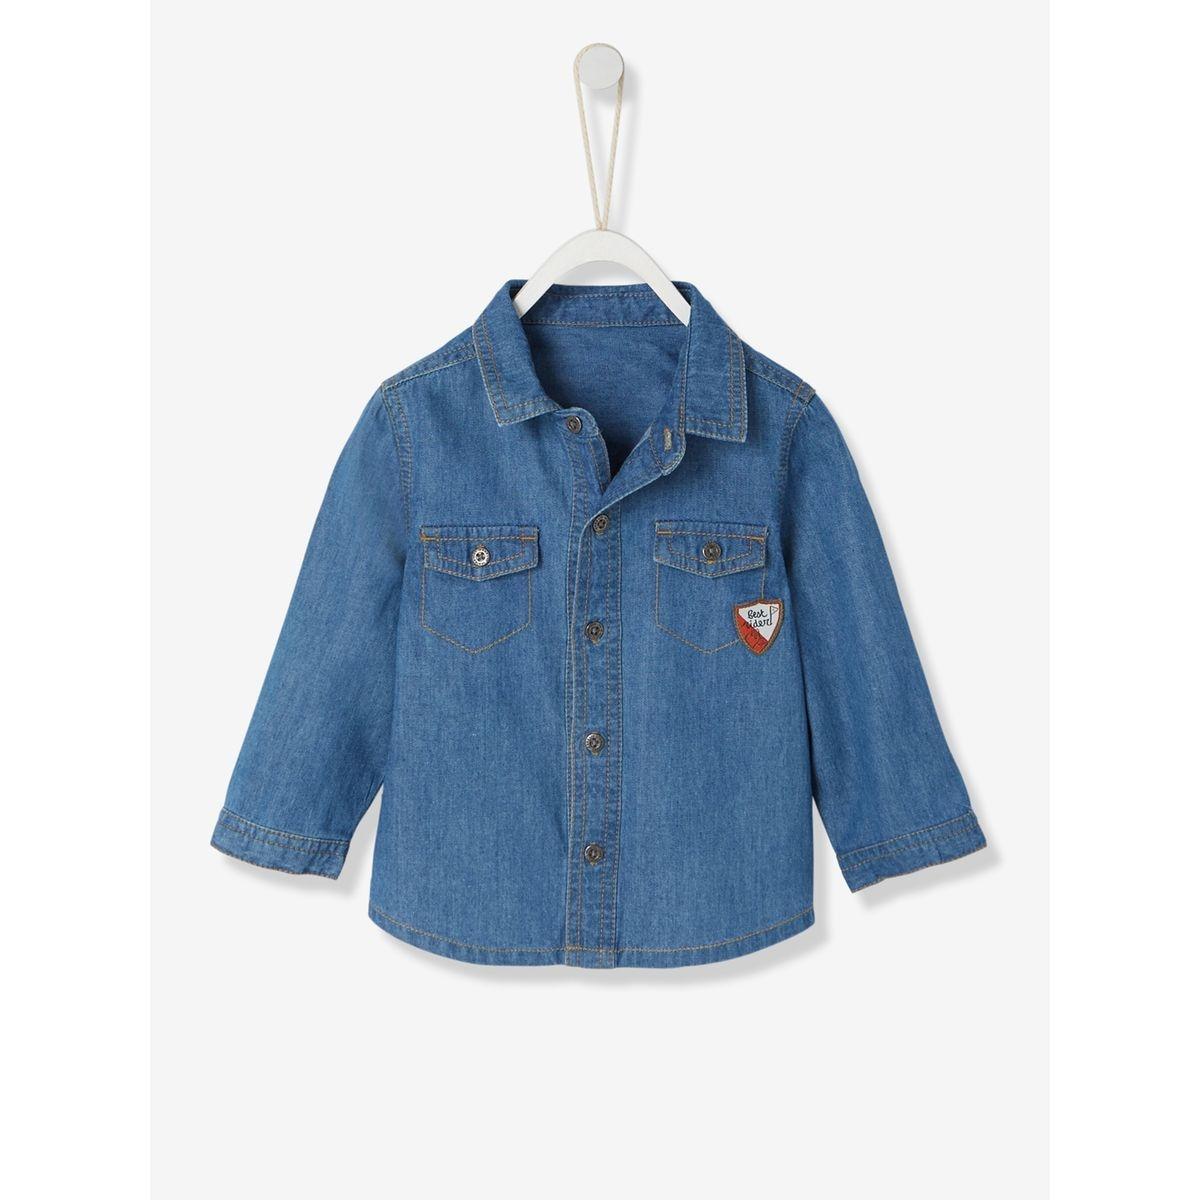 Chemise en jean bébé garçon